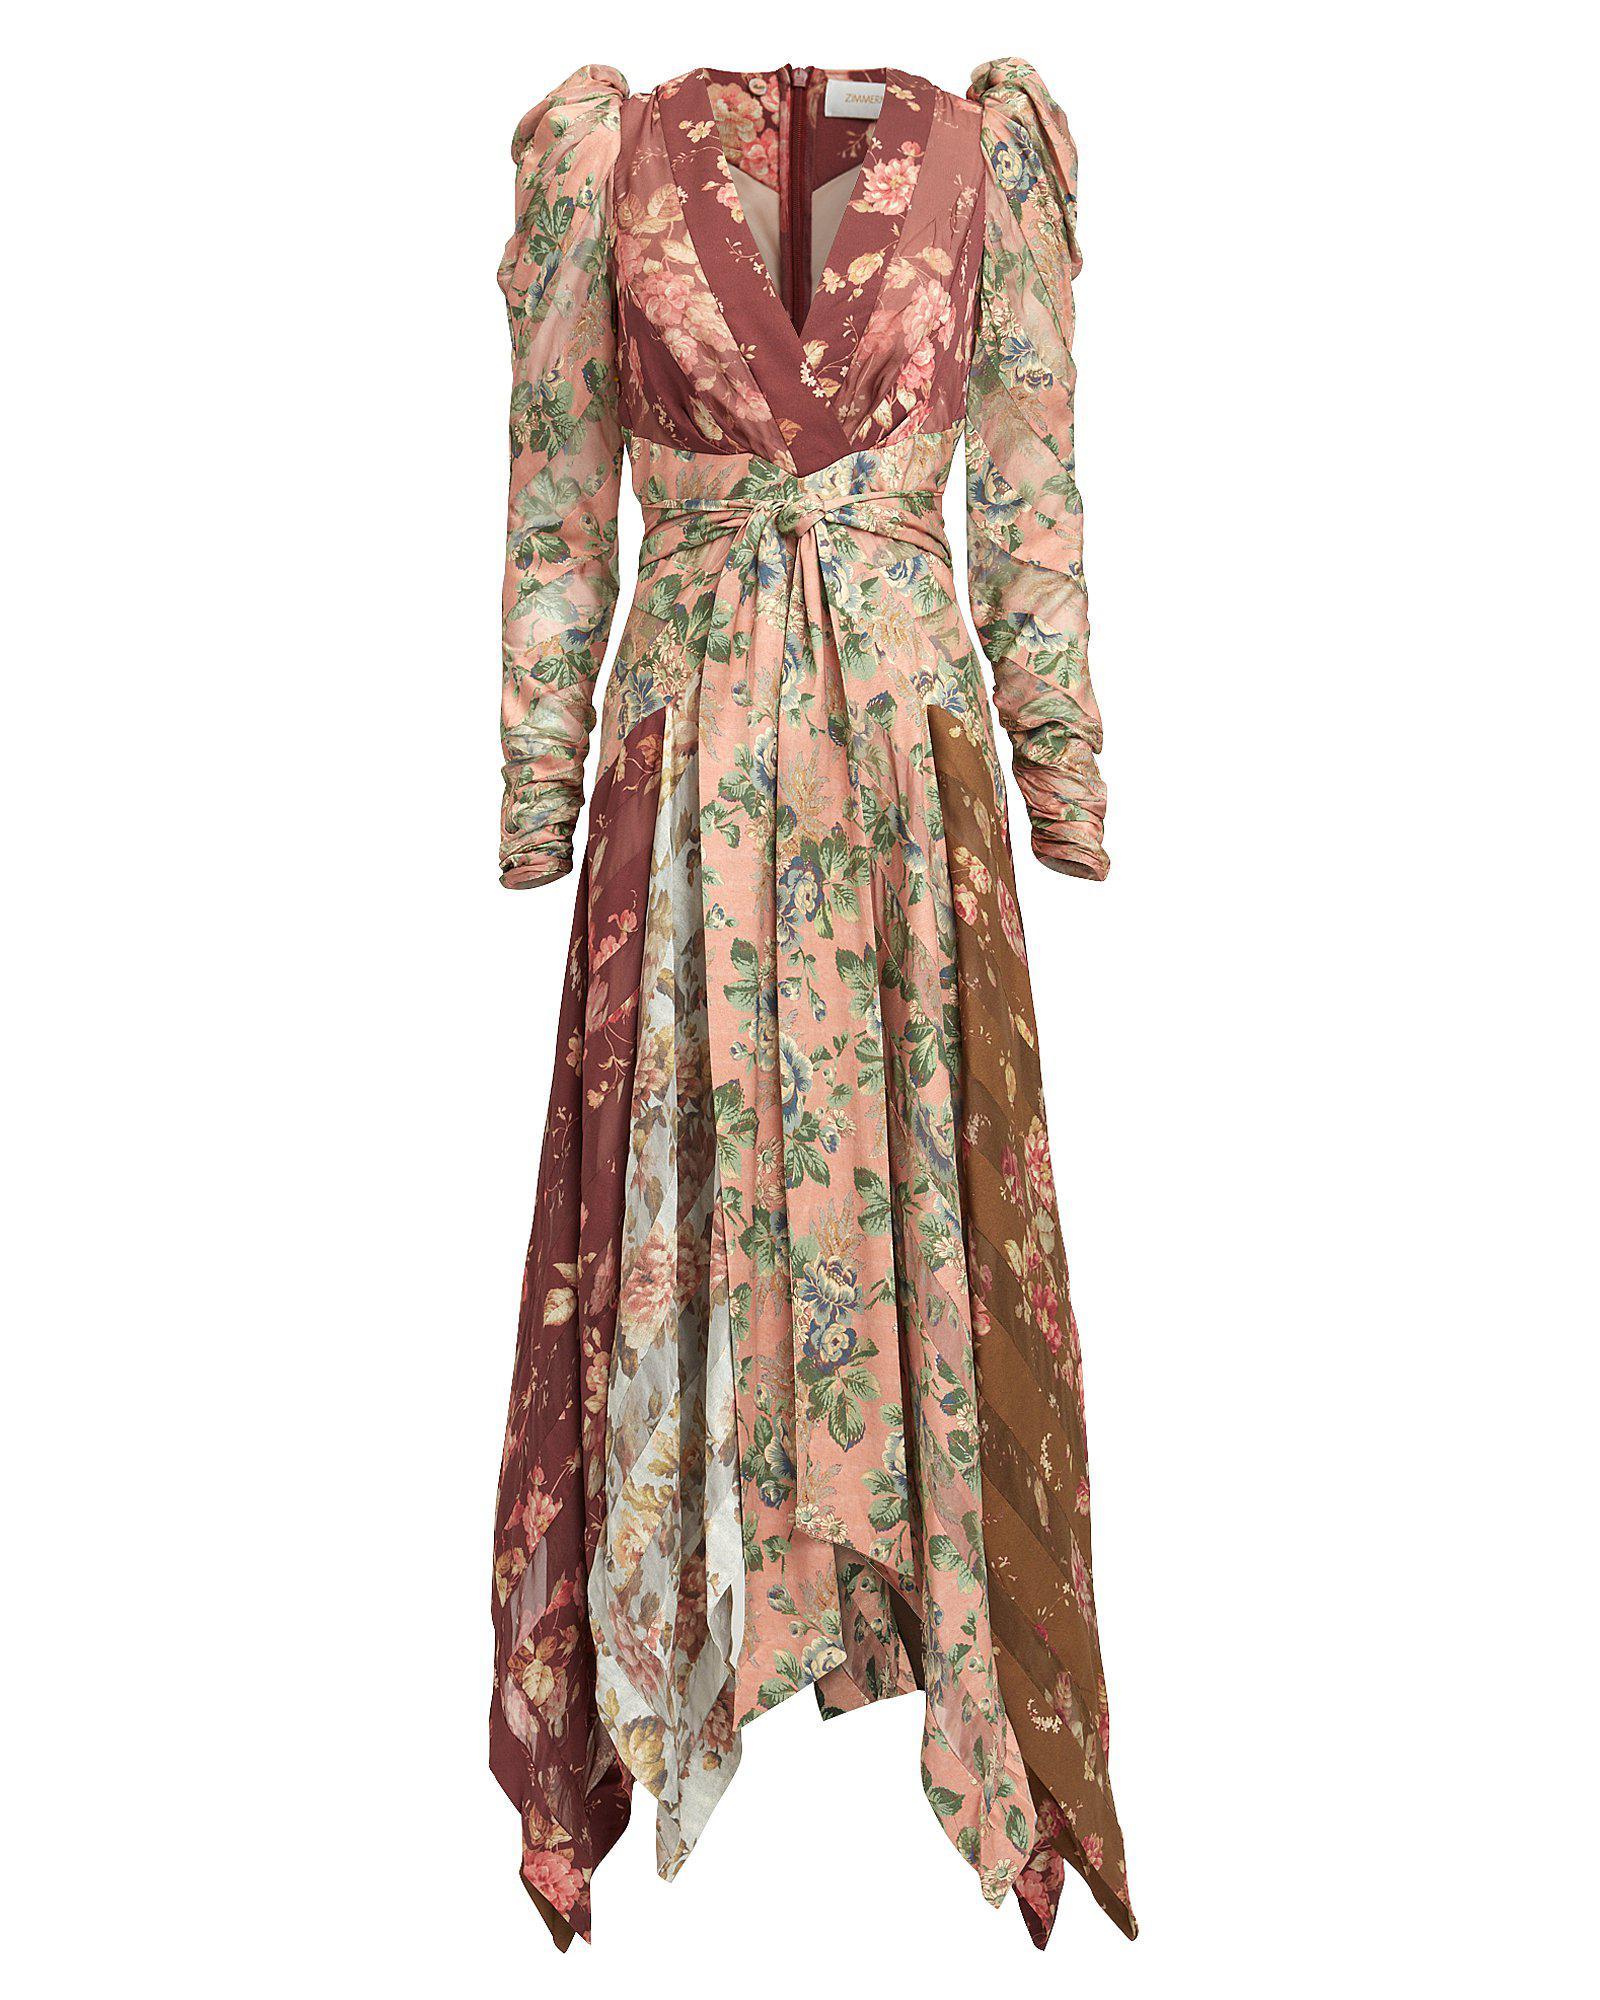 Stylebop Printed Flores Ruffle Silk Unbridled El beige Chiffon Zimmermann Dress CrdoxWQBeE